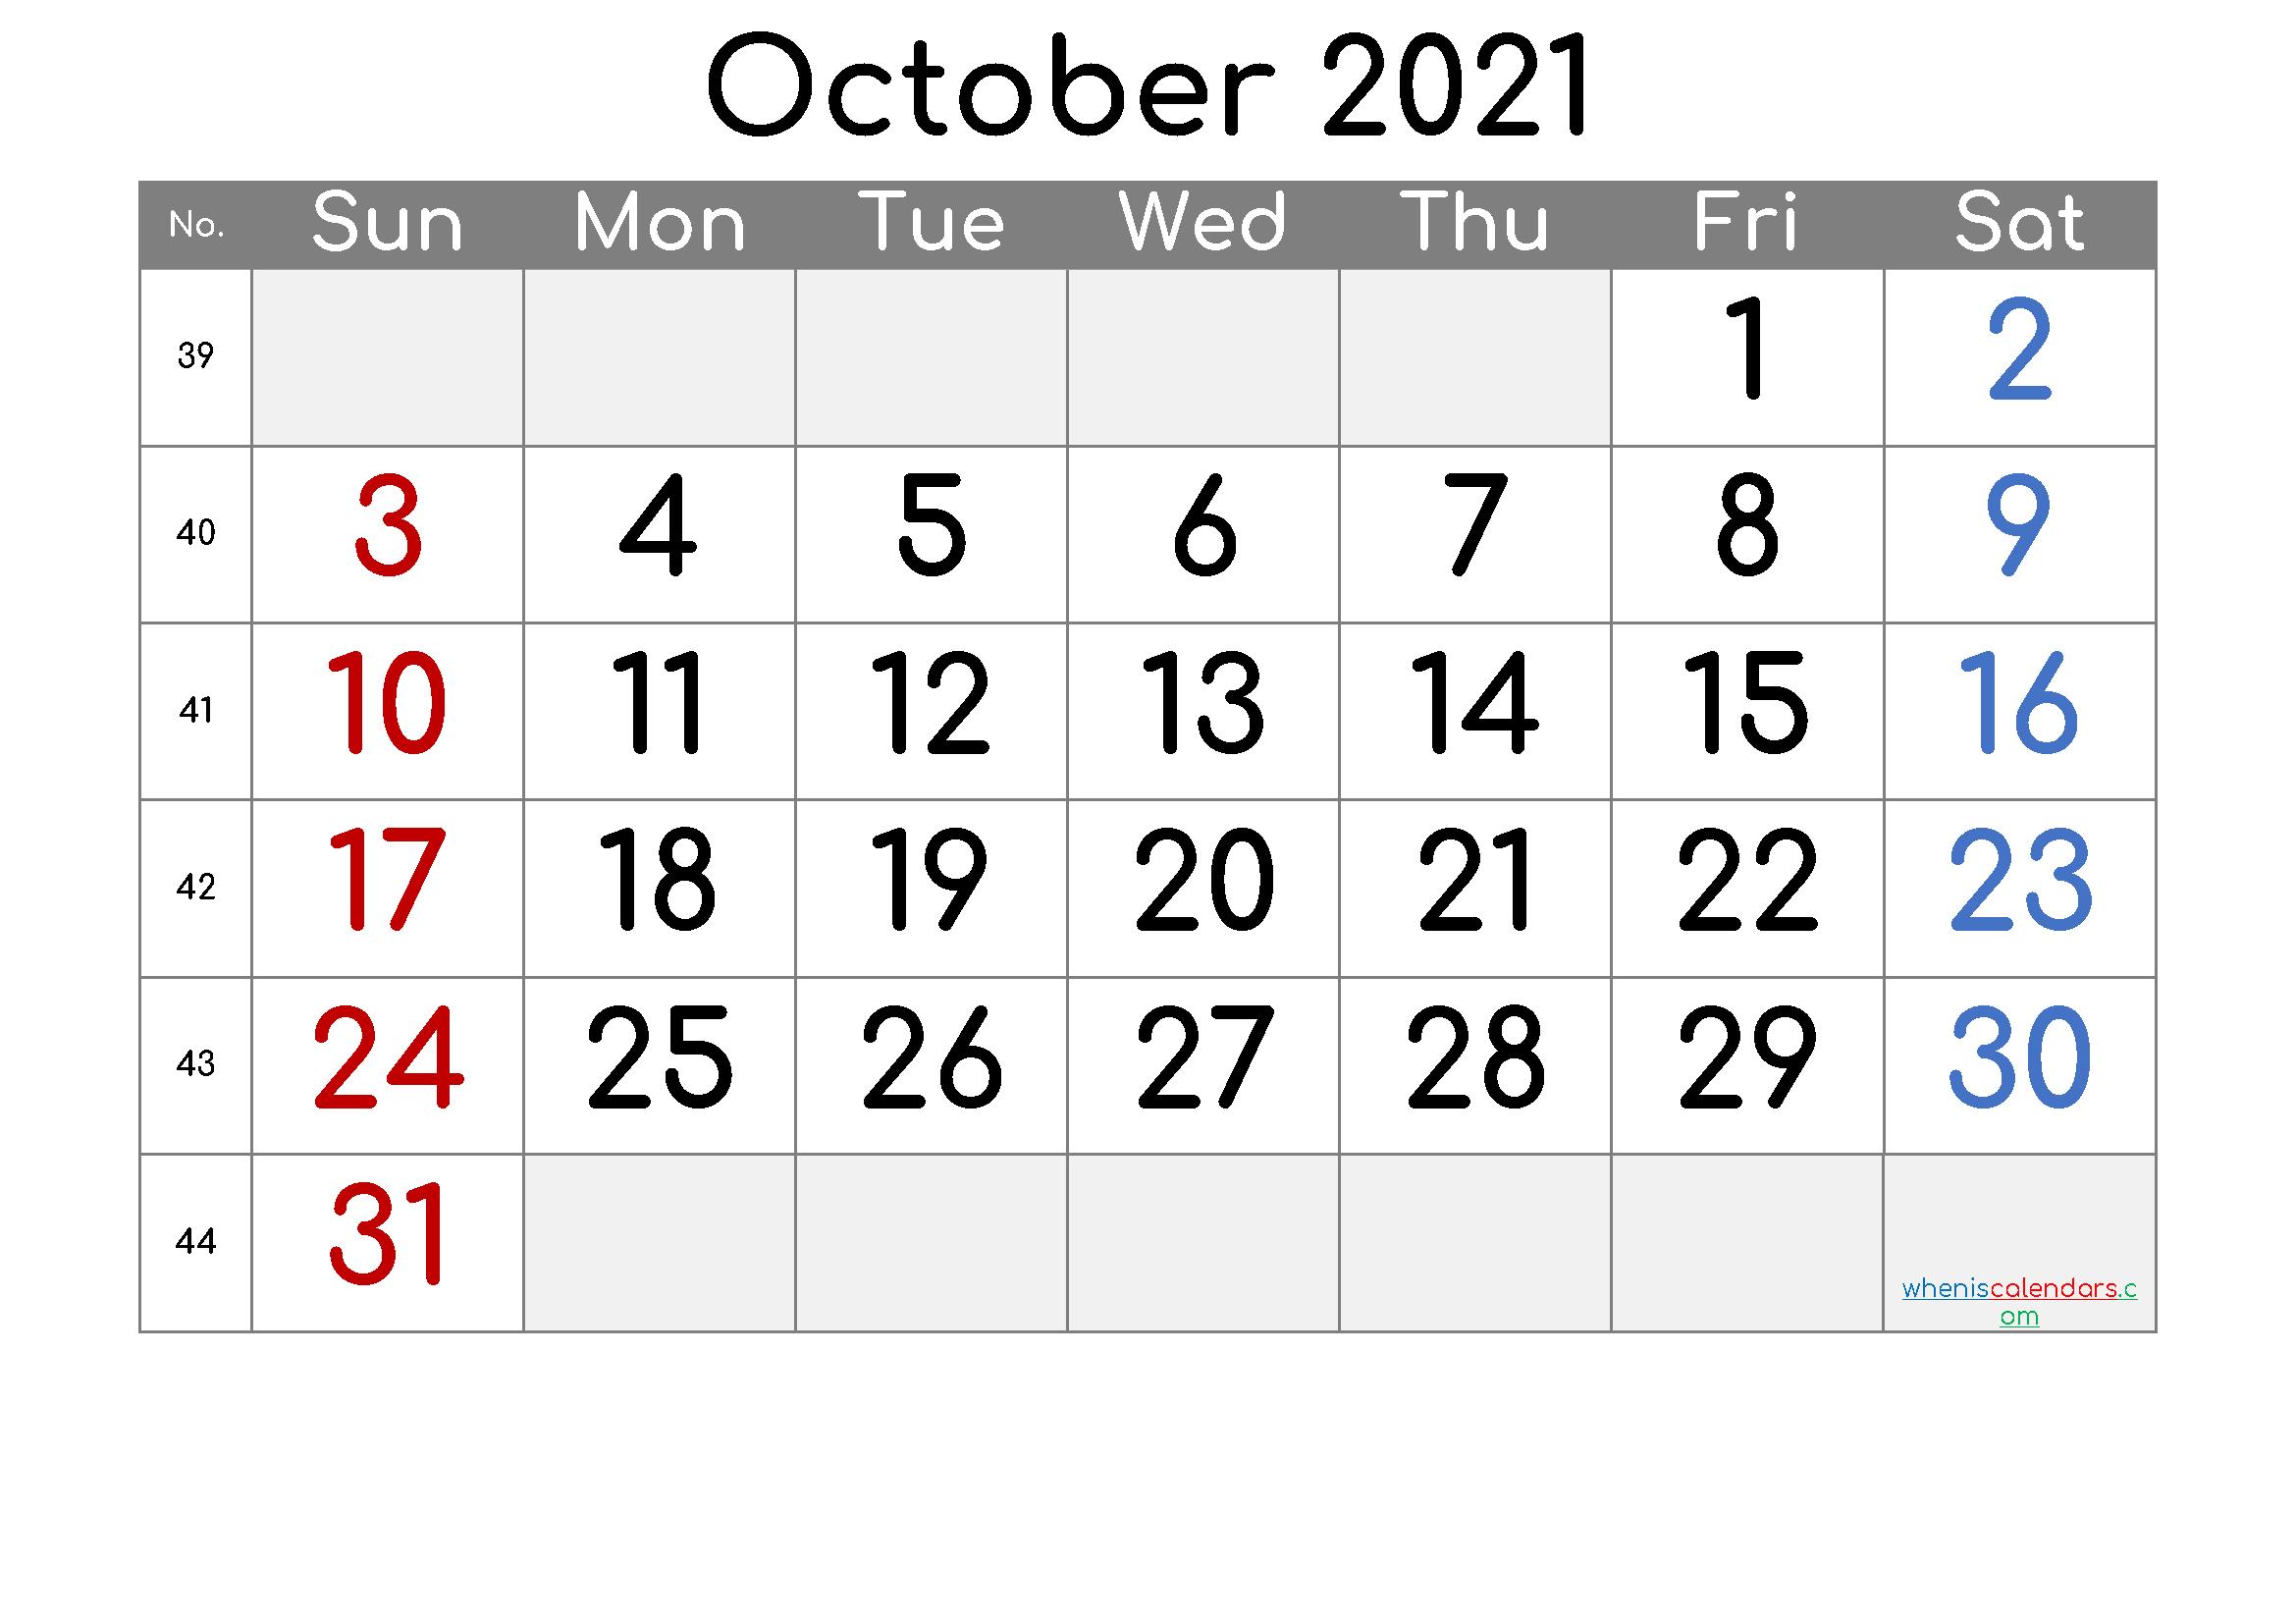 20+ October Calendar 2021 - Free Download Printable